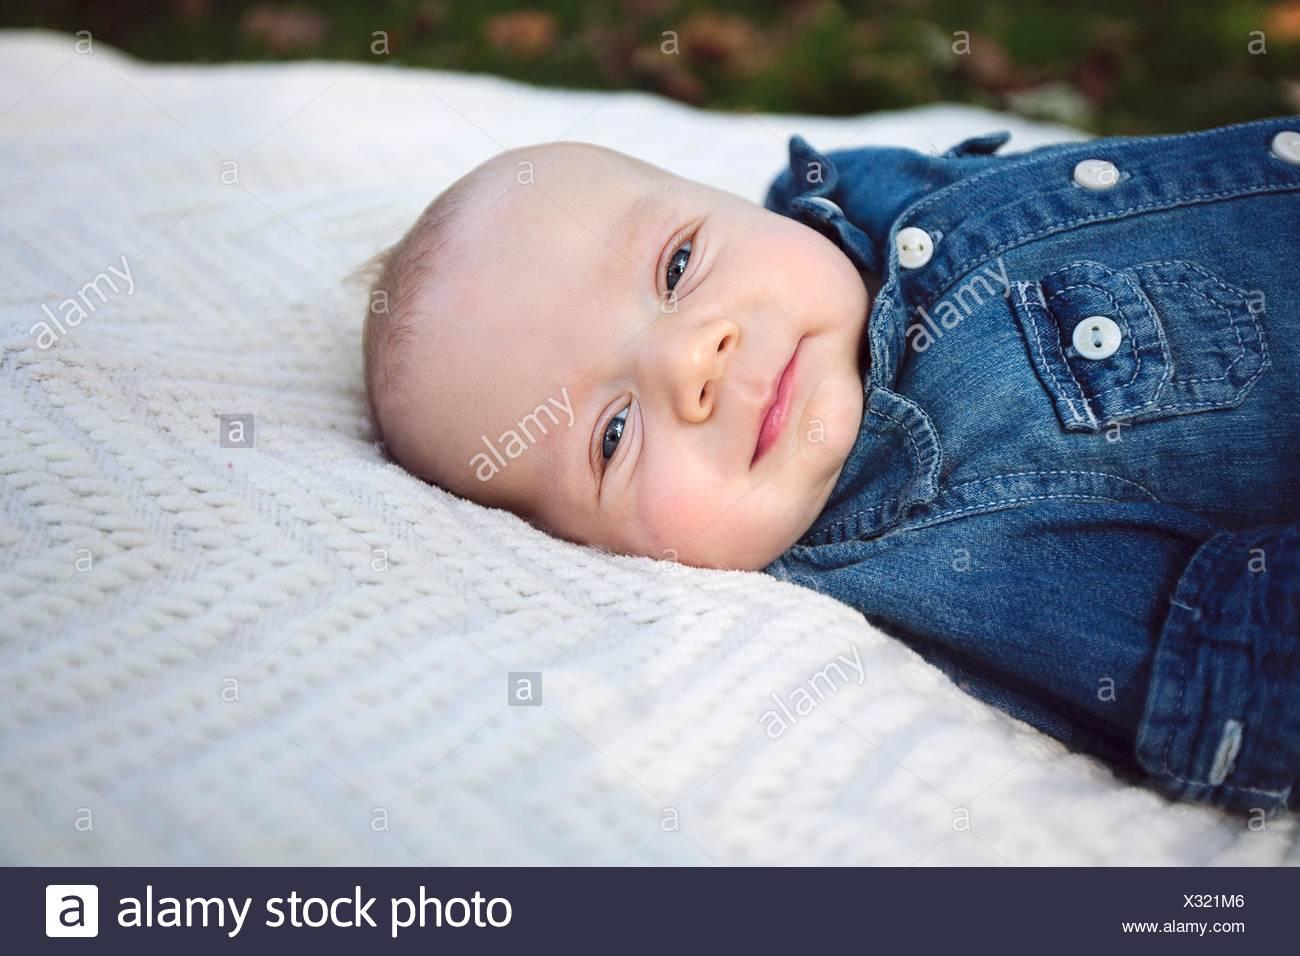 Side view of baby boy wearing denim shirt lying on blanket looking at camera smiling - Stock Image